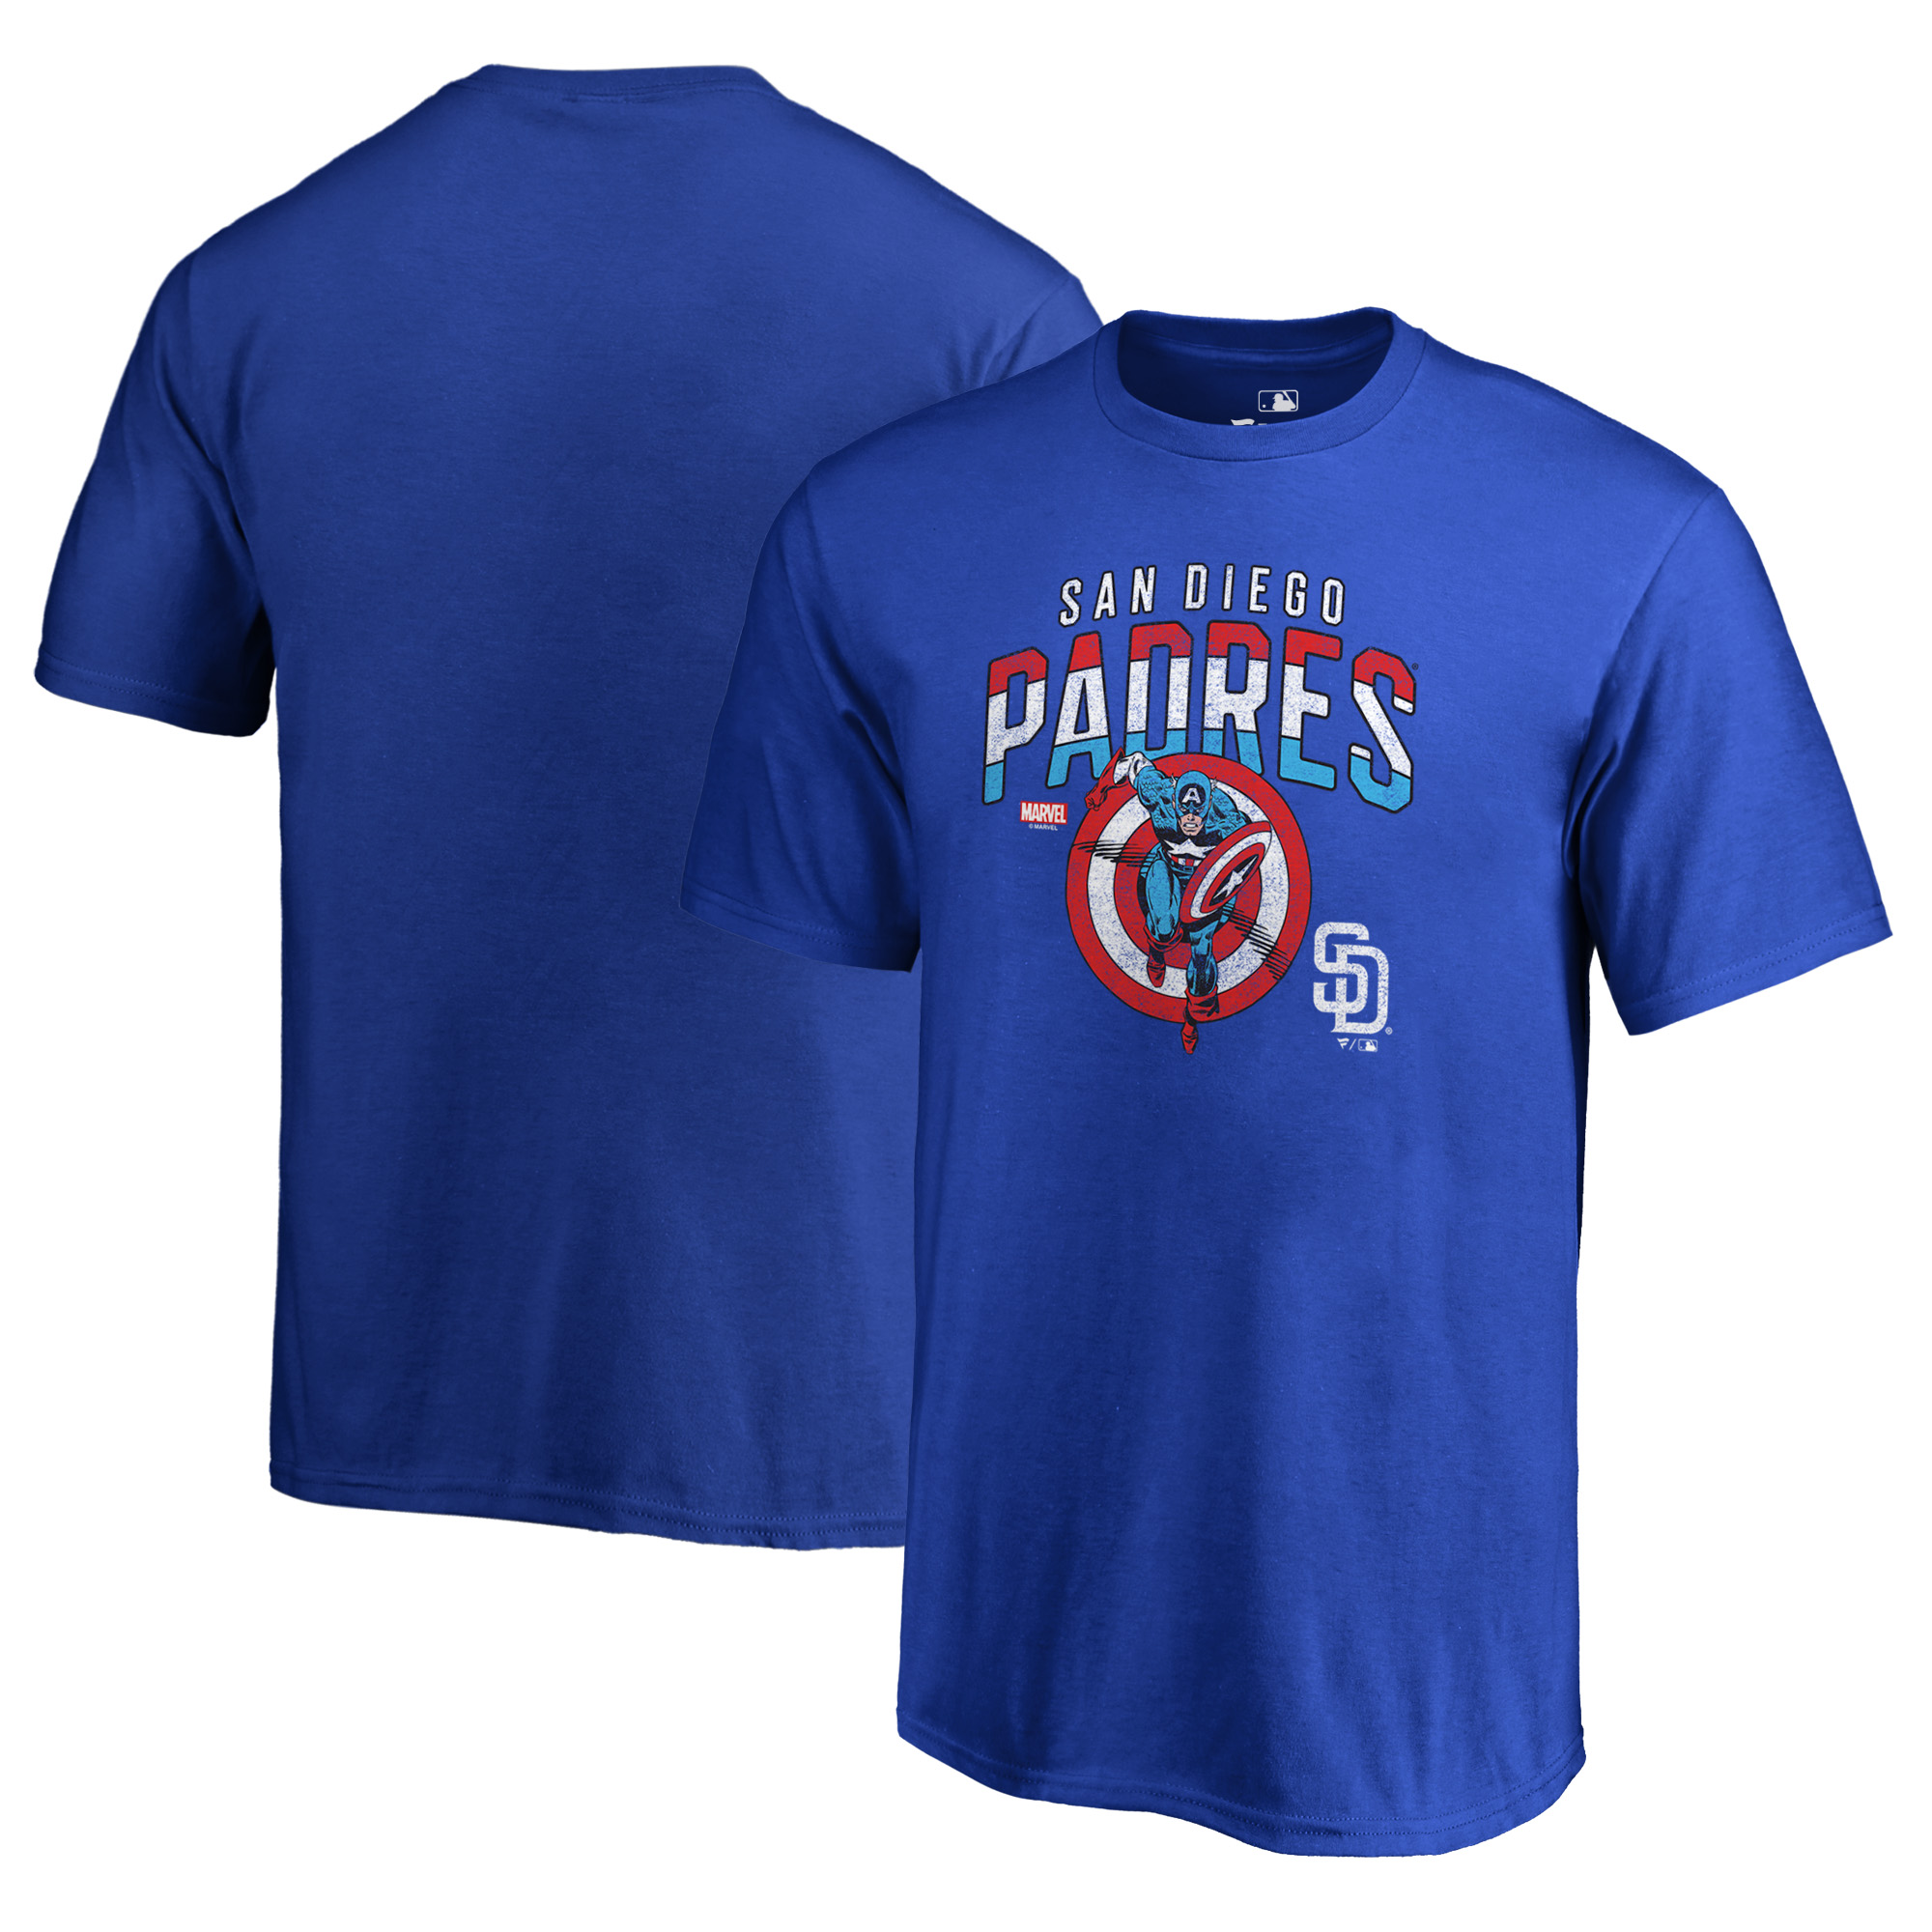 San Diego Padres Fanatics Branded Youth MLB Marvel Captain's Shield T-Shirt - Royal